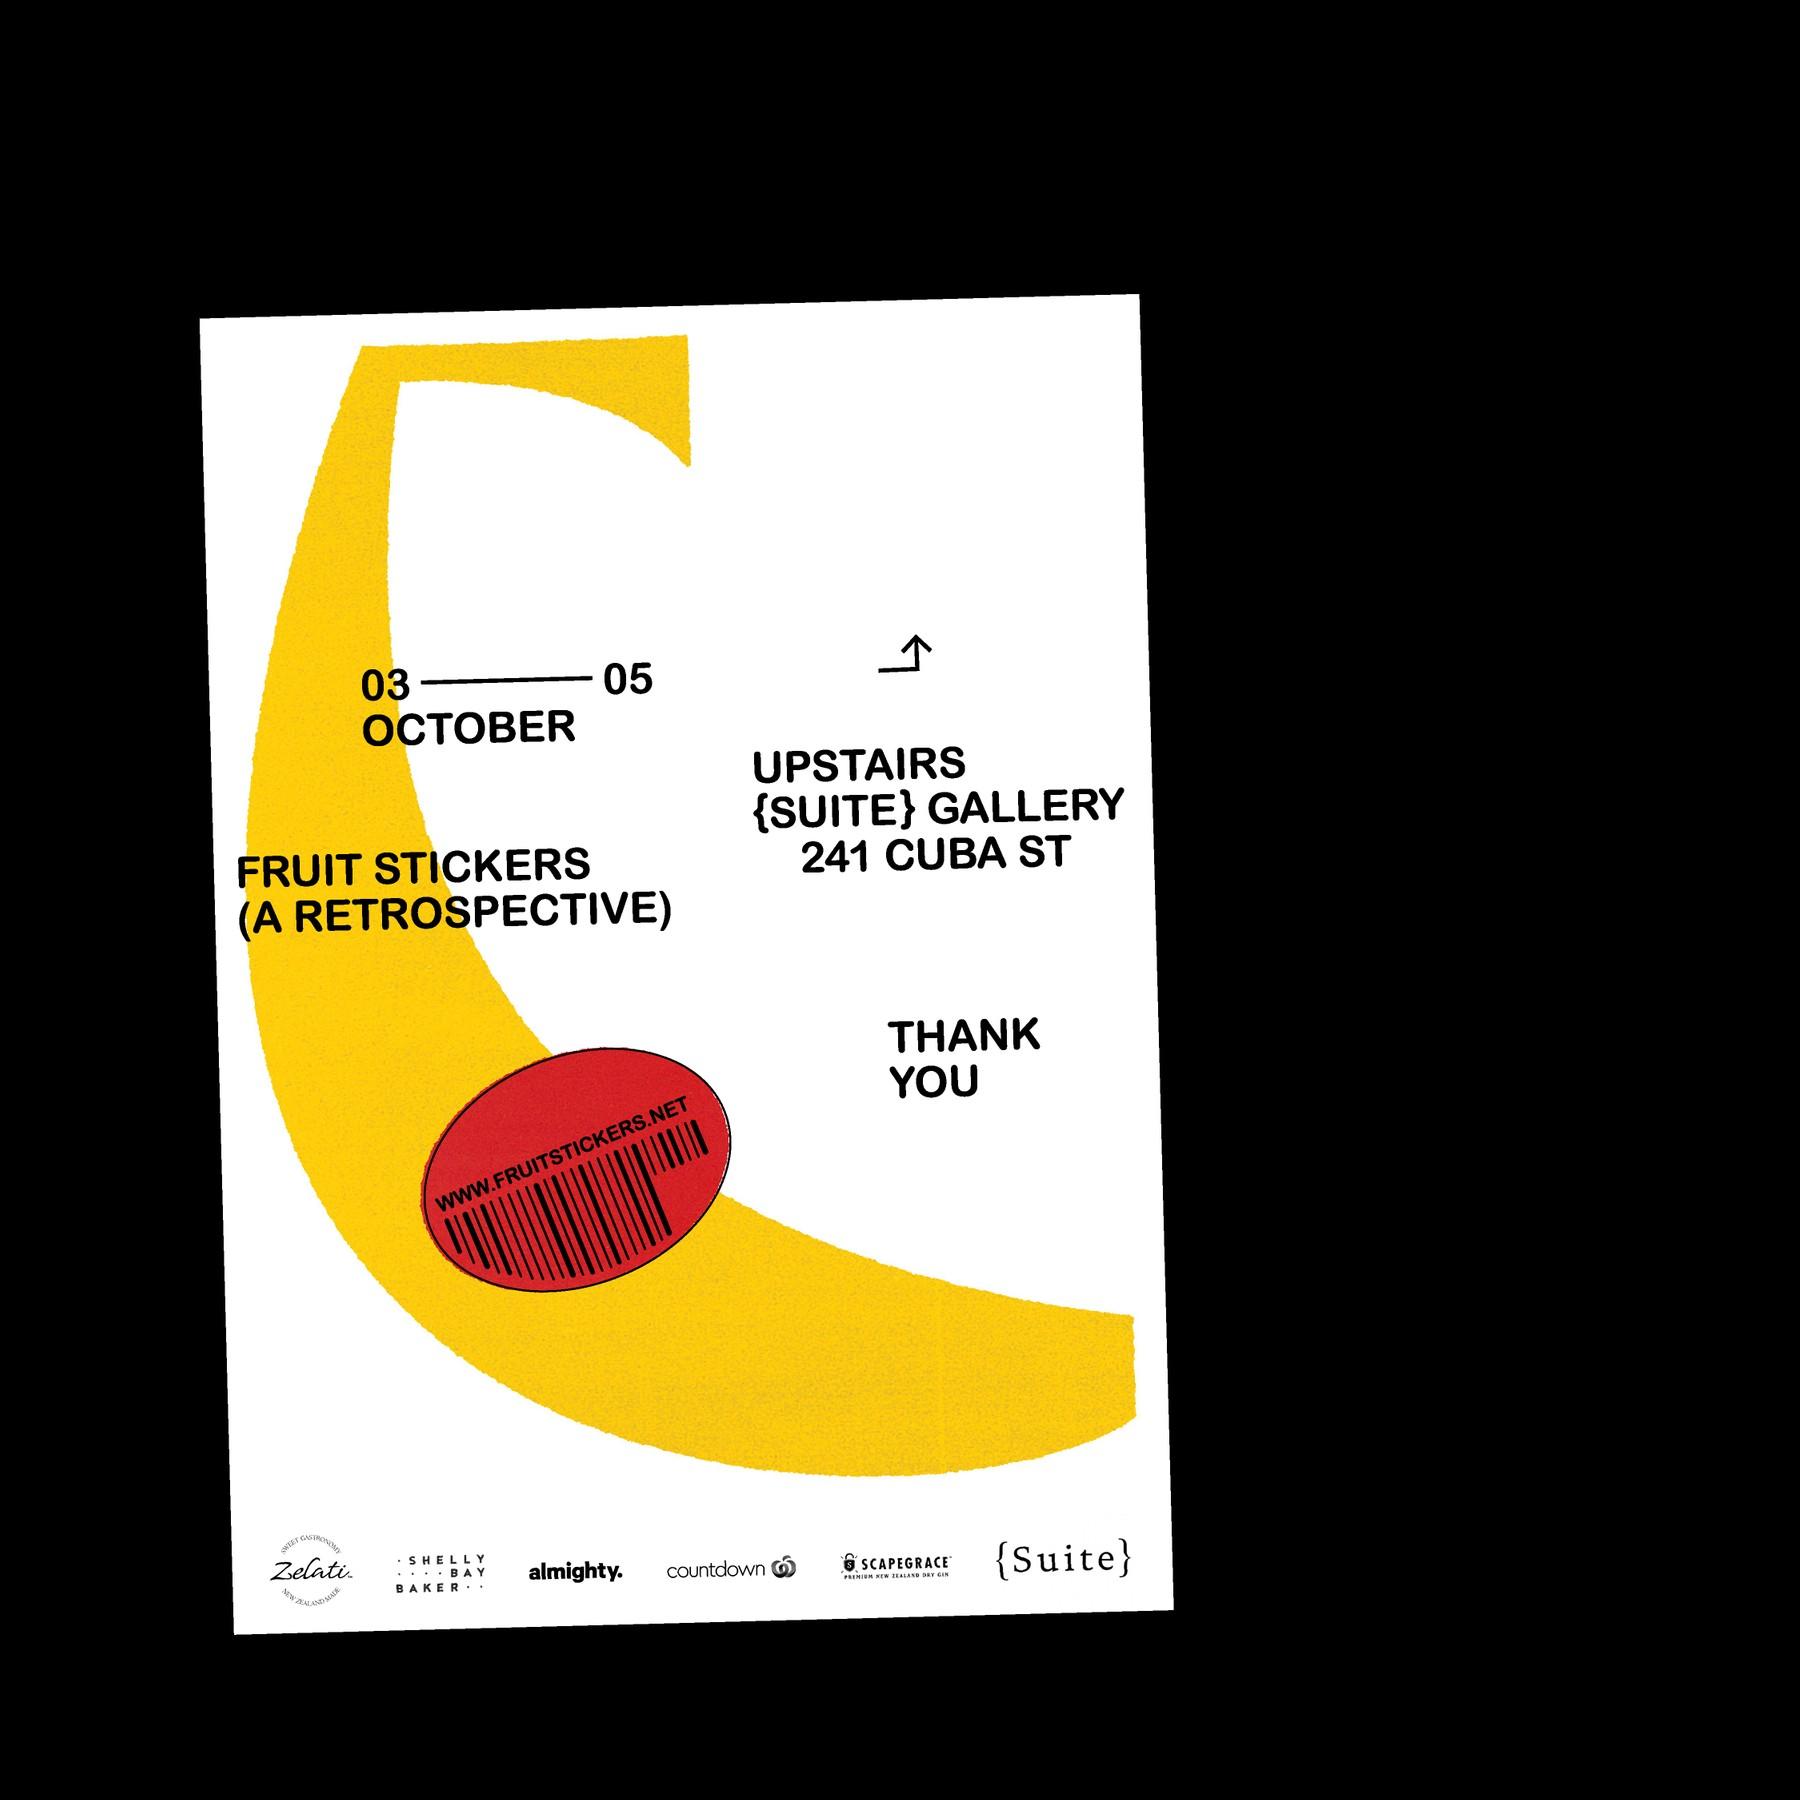 fruitstickers-poster.jpg